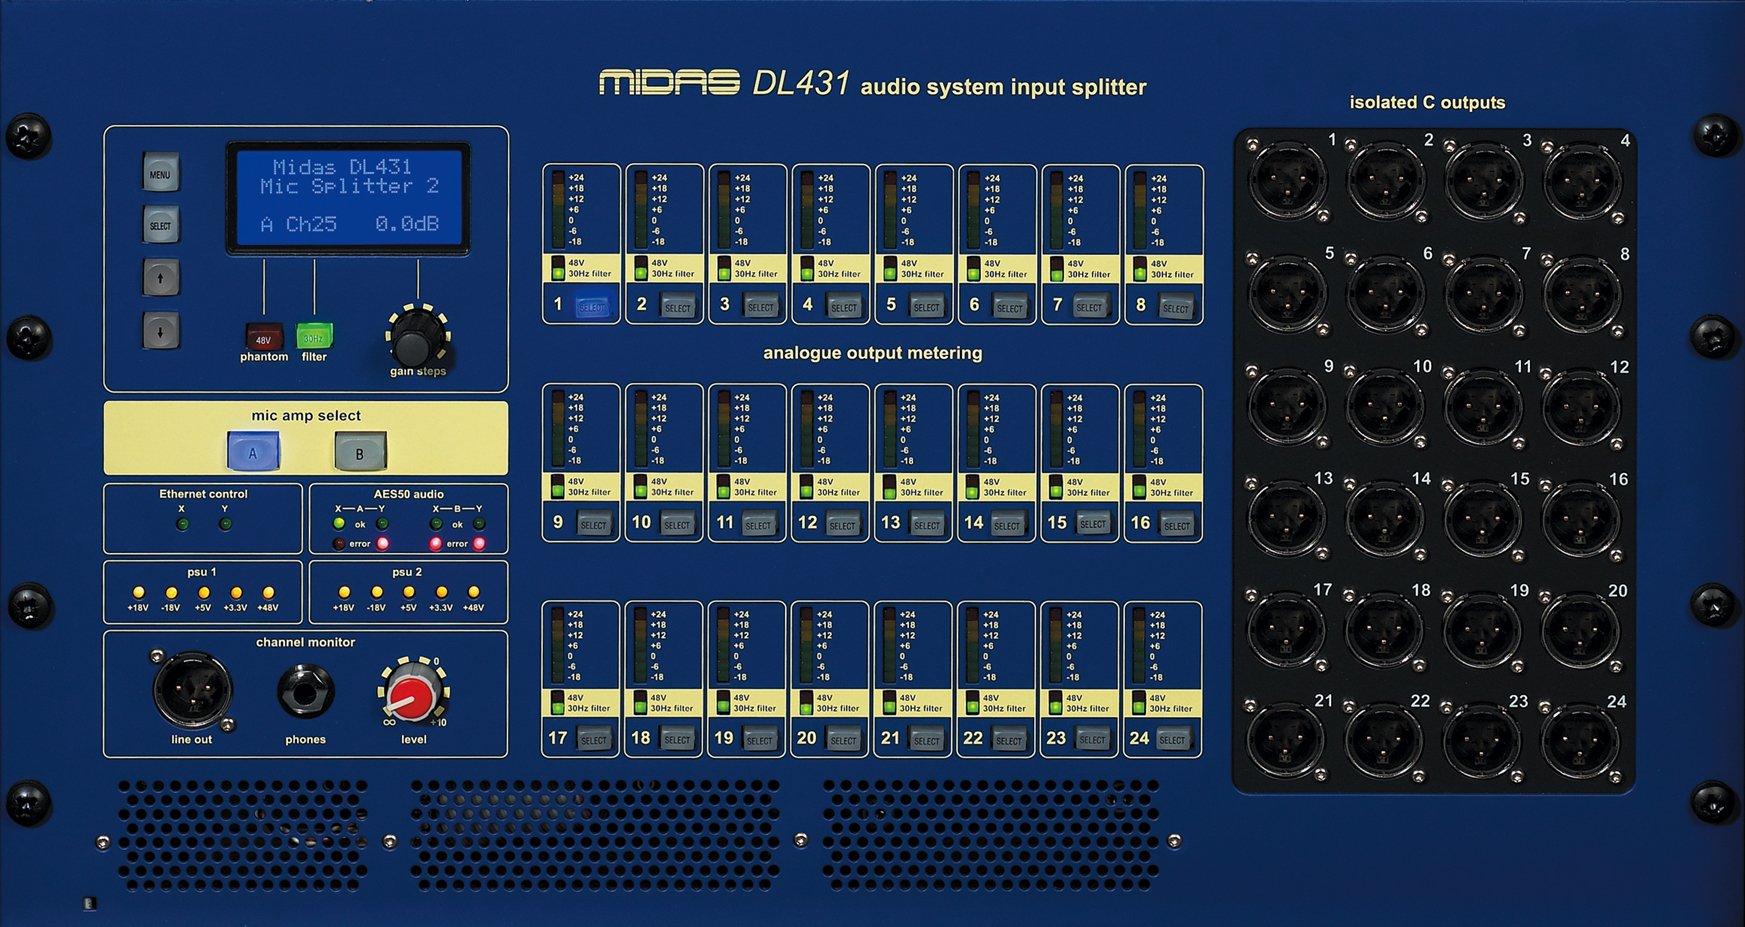 6RU 5-Way Fixed Input Splitter & I/O Box with 24 Mic/Line Ins